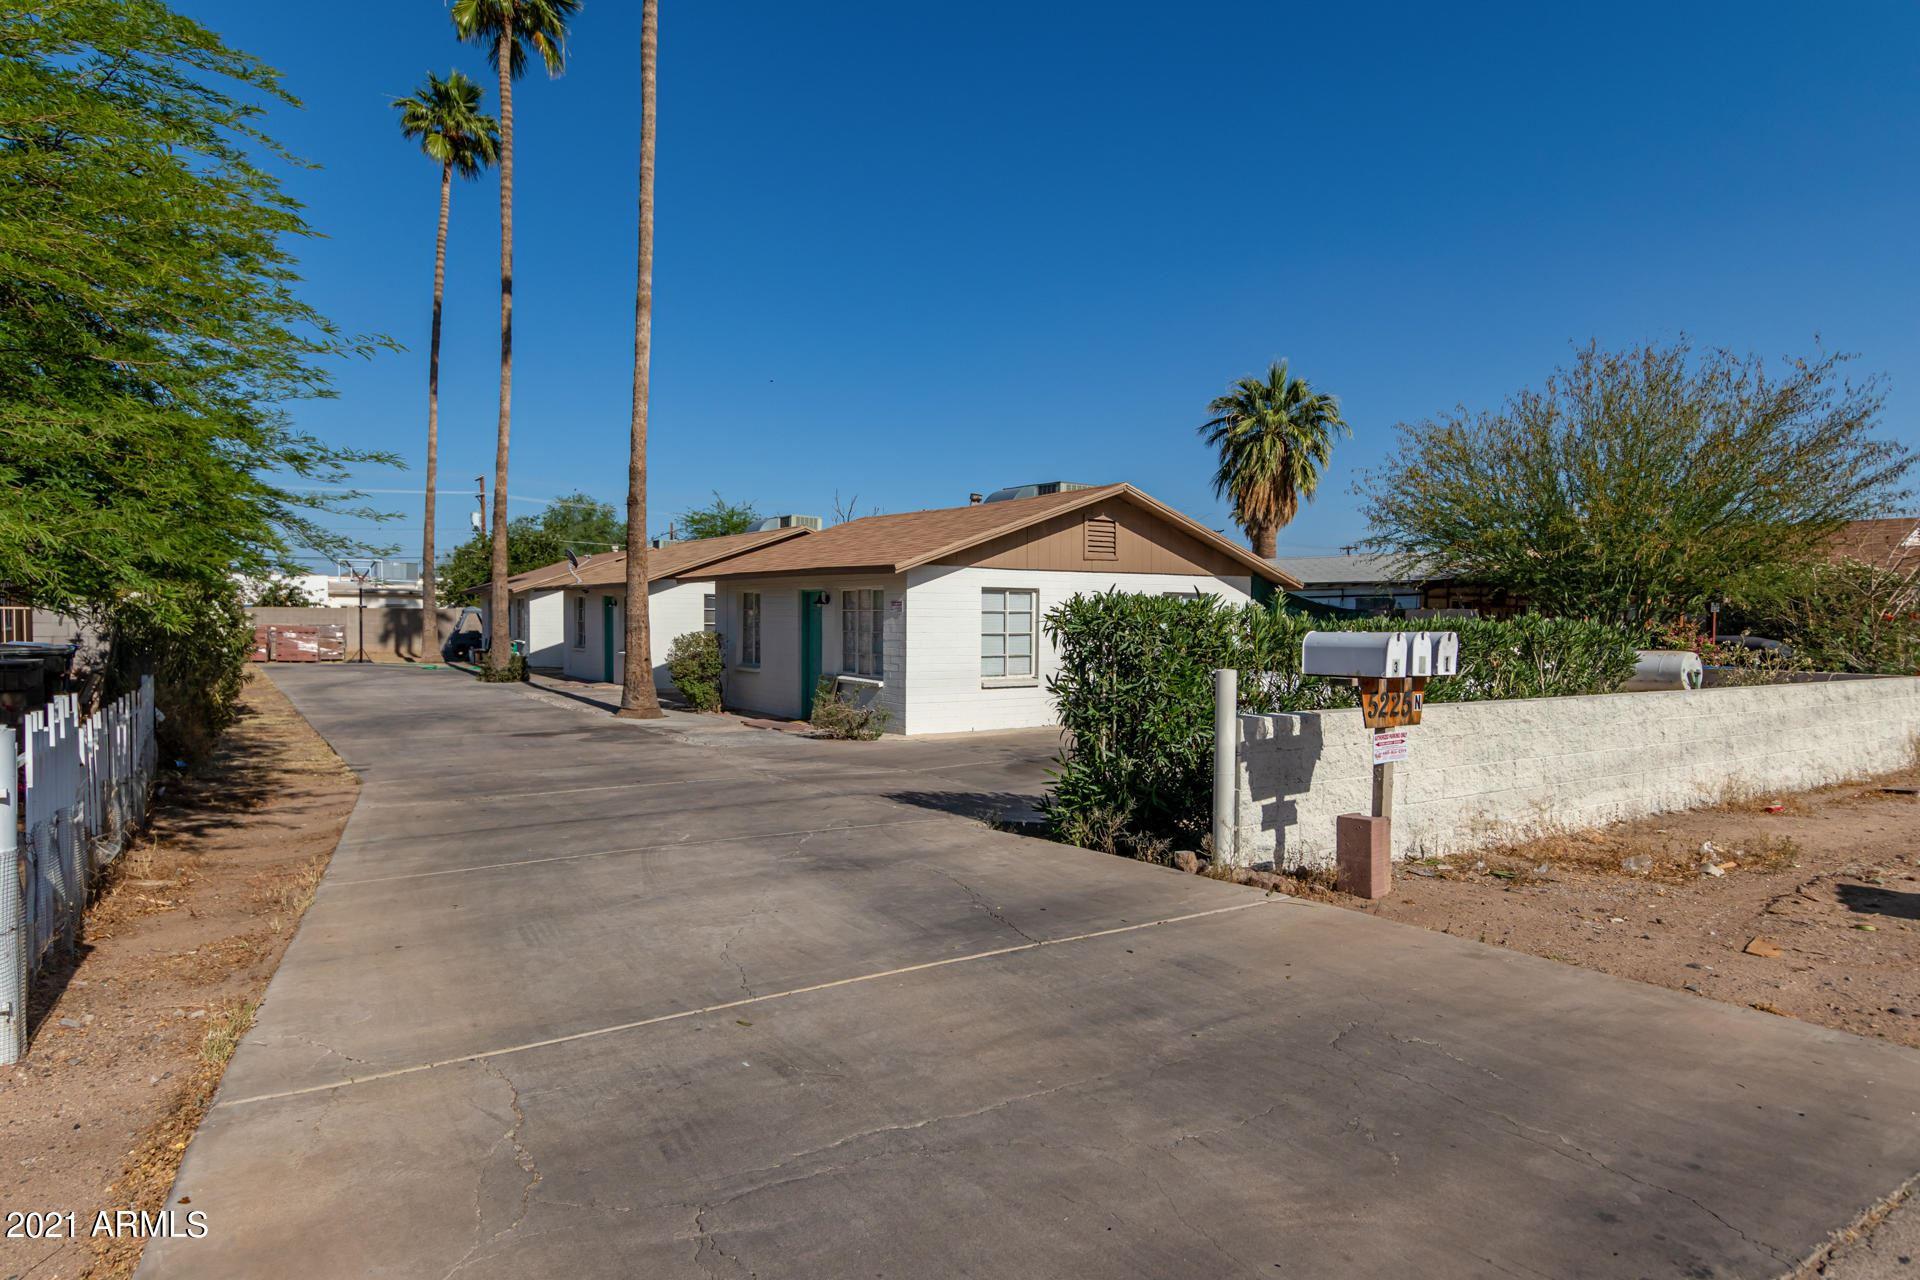 5225 N 23RD Avenue, Phoenix, AZ 85015 - MLS#: 6237214